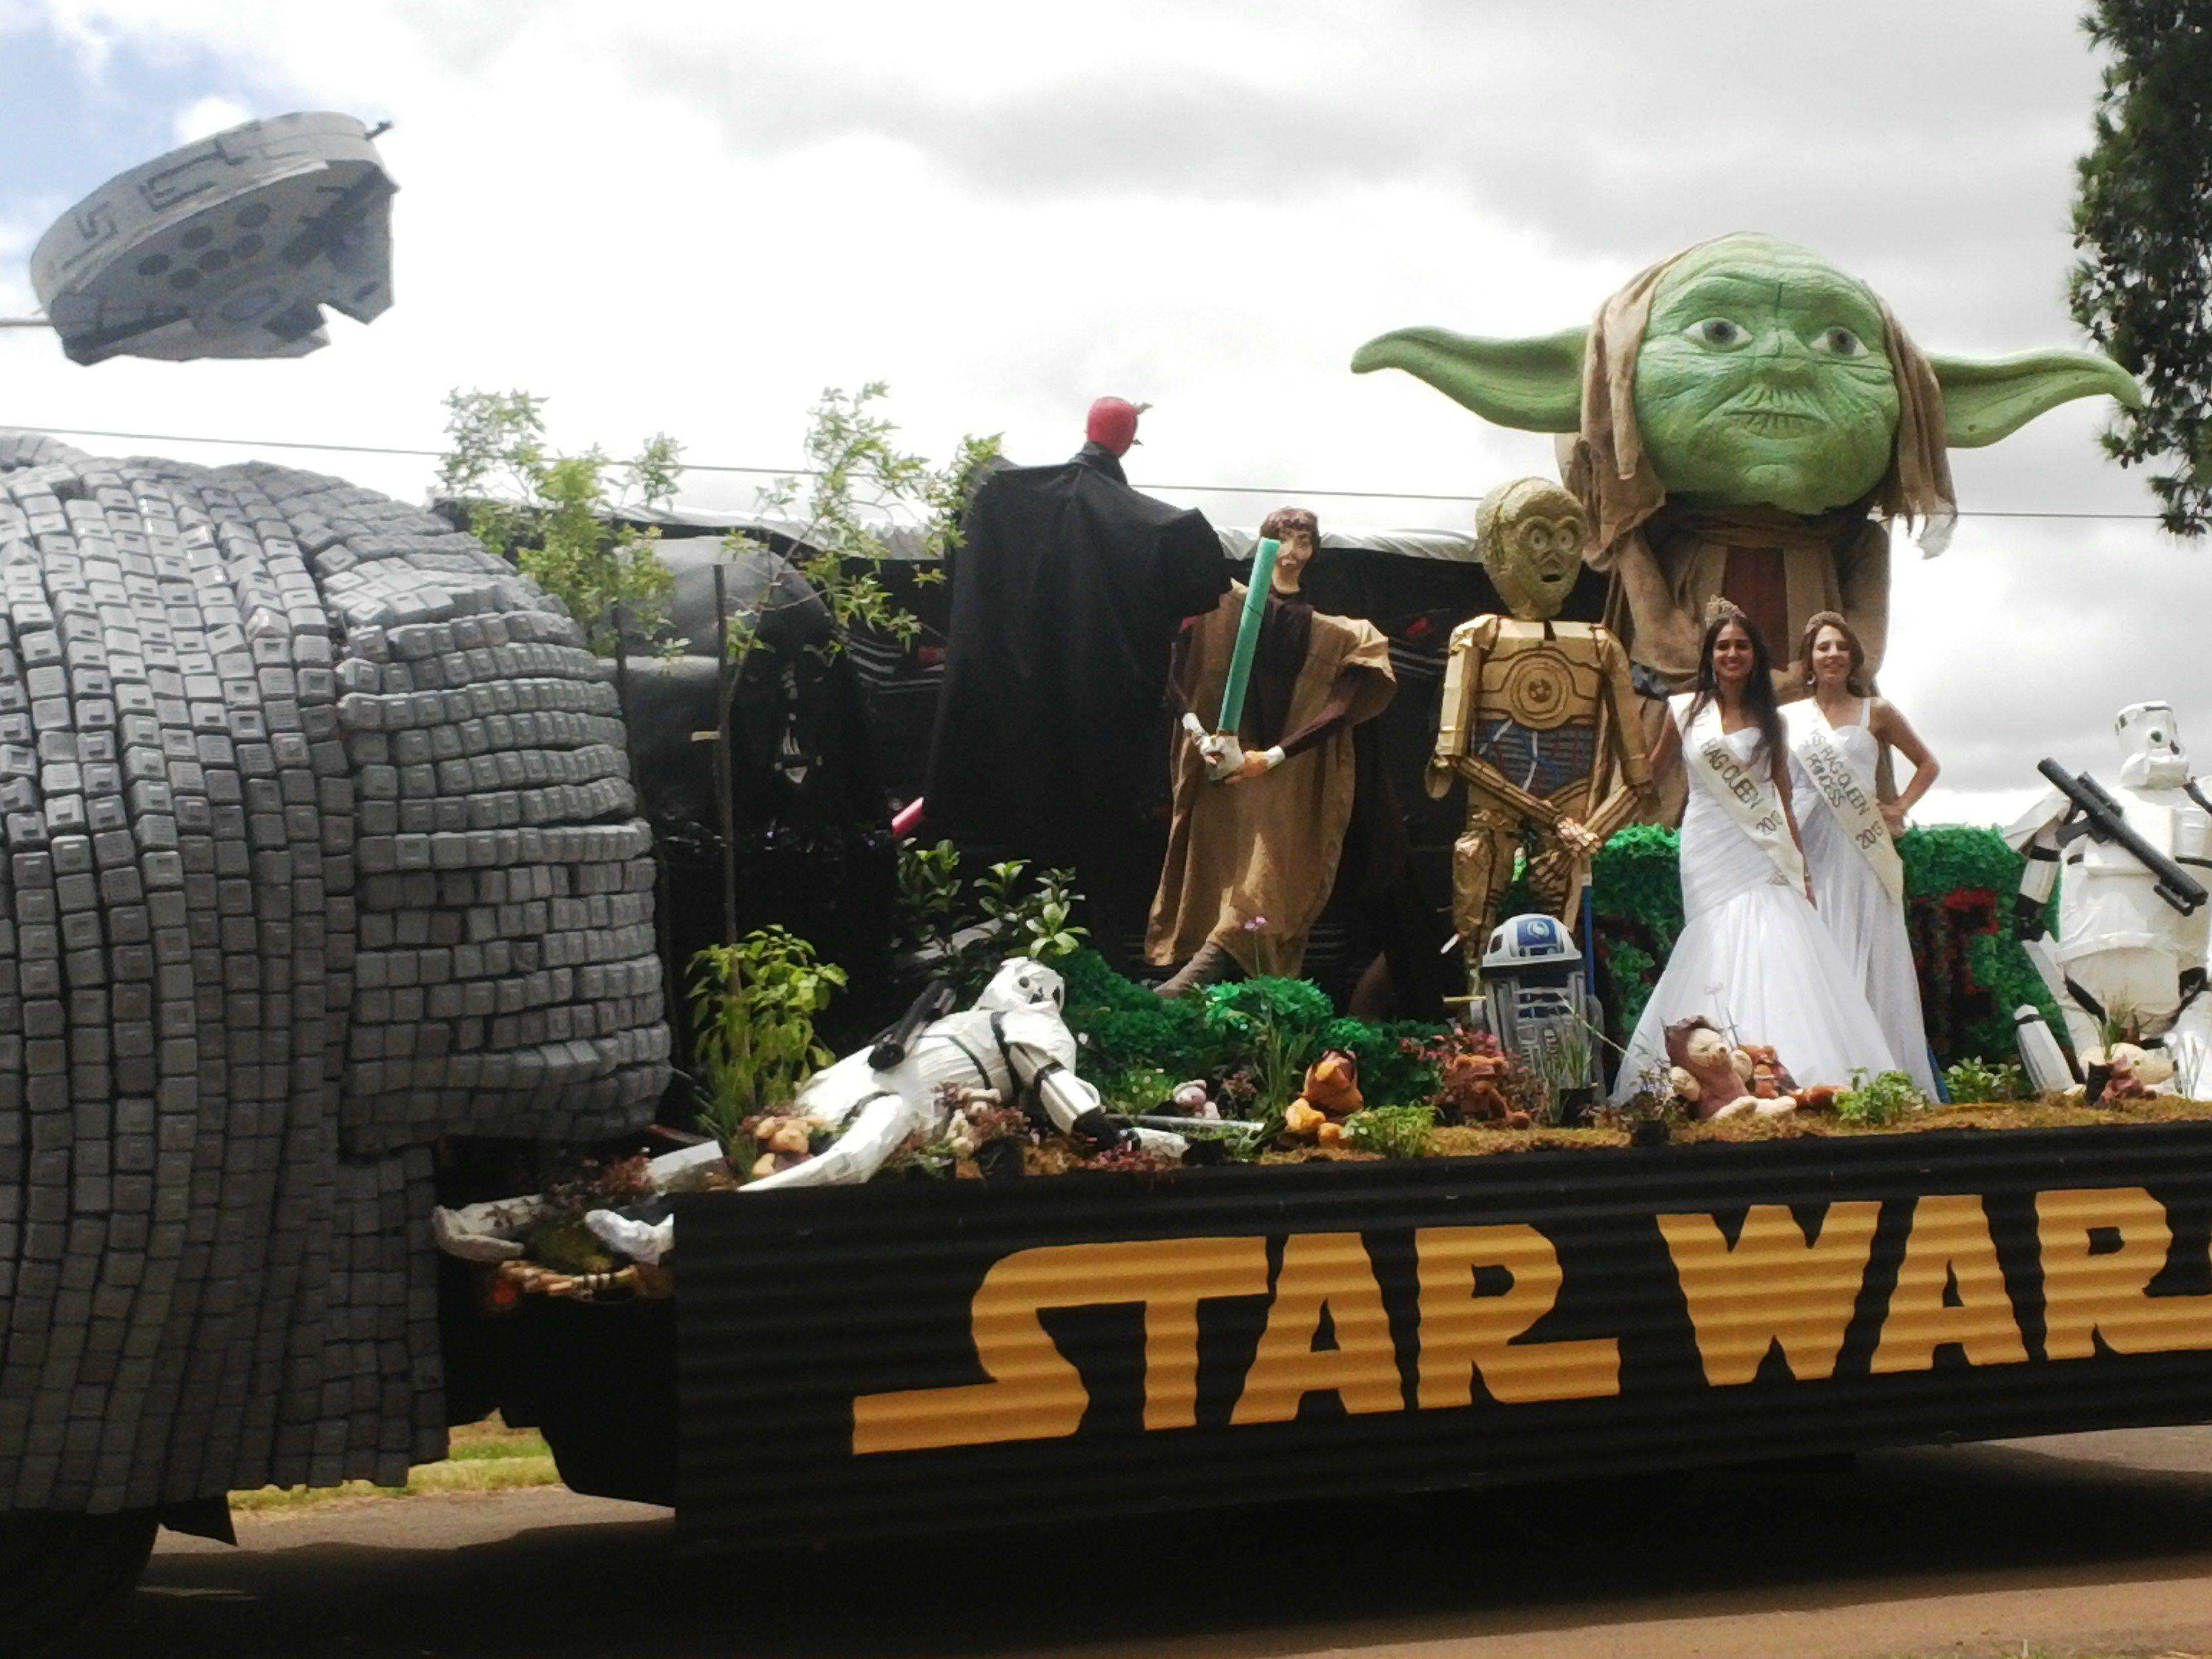 Star wars parade float ideas google search float ideas for Princess float ideas